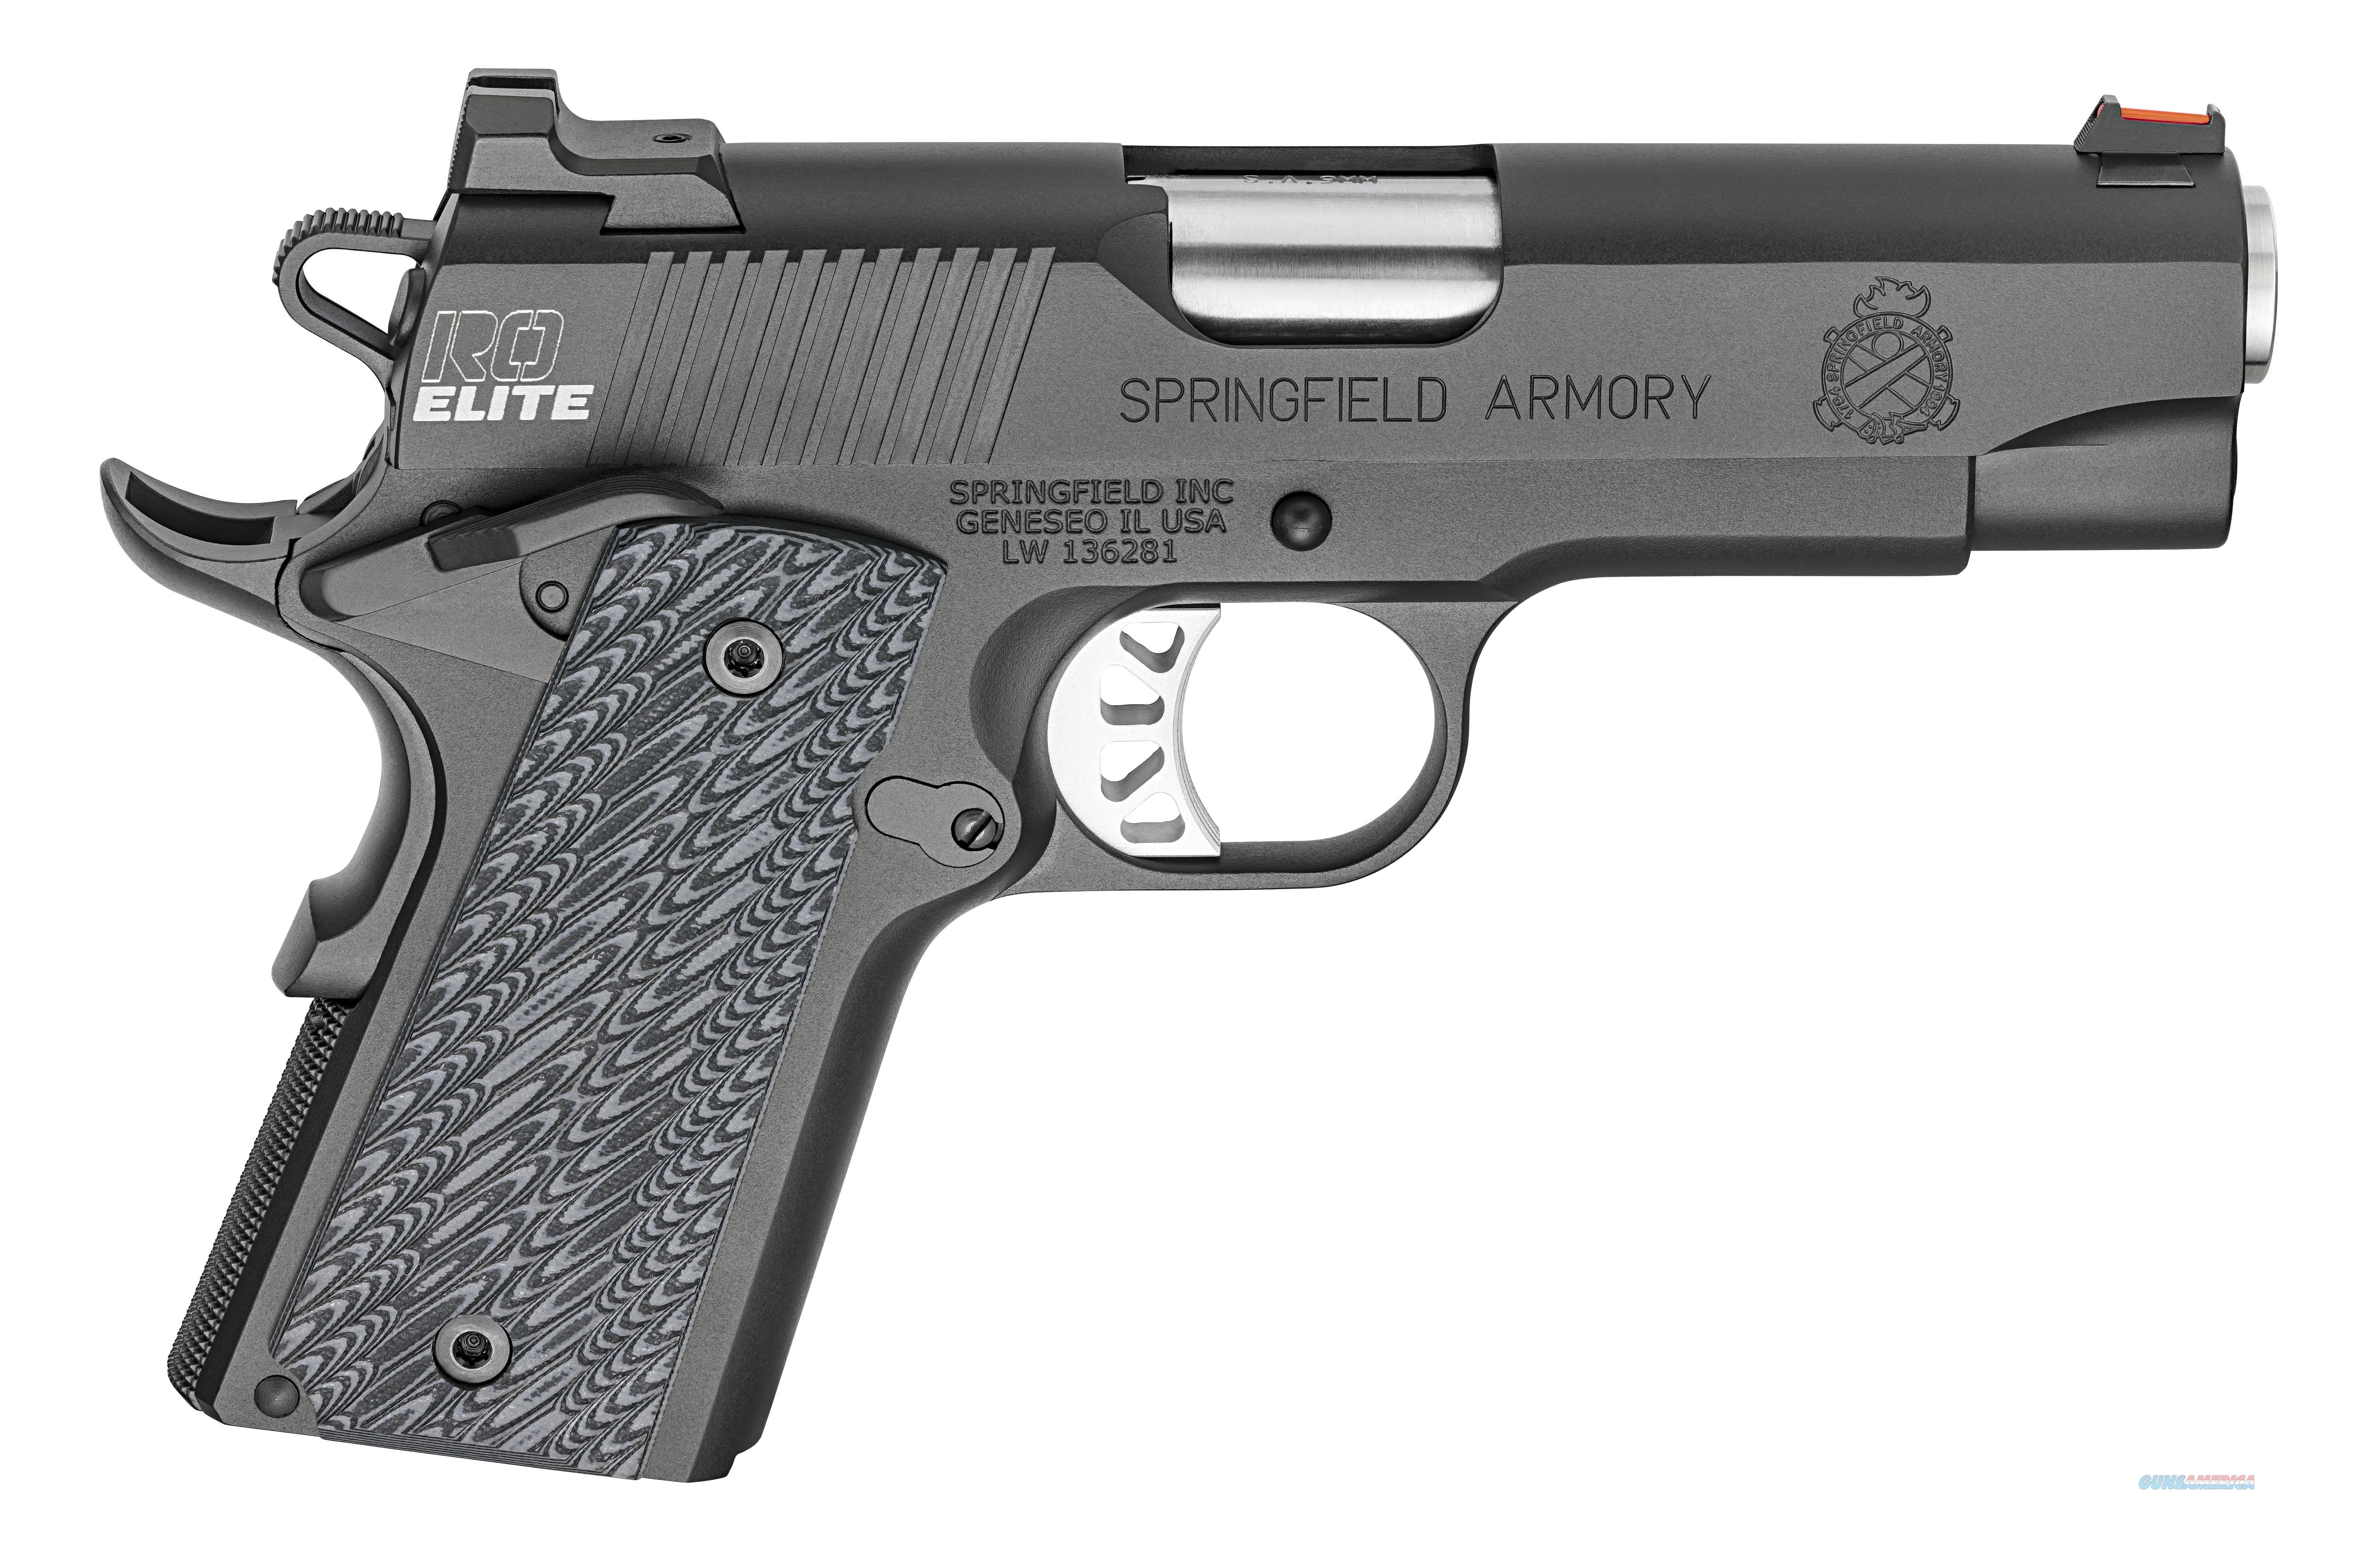 "Springfield 1911 Range Officer Elite 9mm 4"" w/Range Bag PI9125E   Guns > Pistols > Springfield Armory Pistols > 1911 Type"